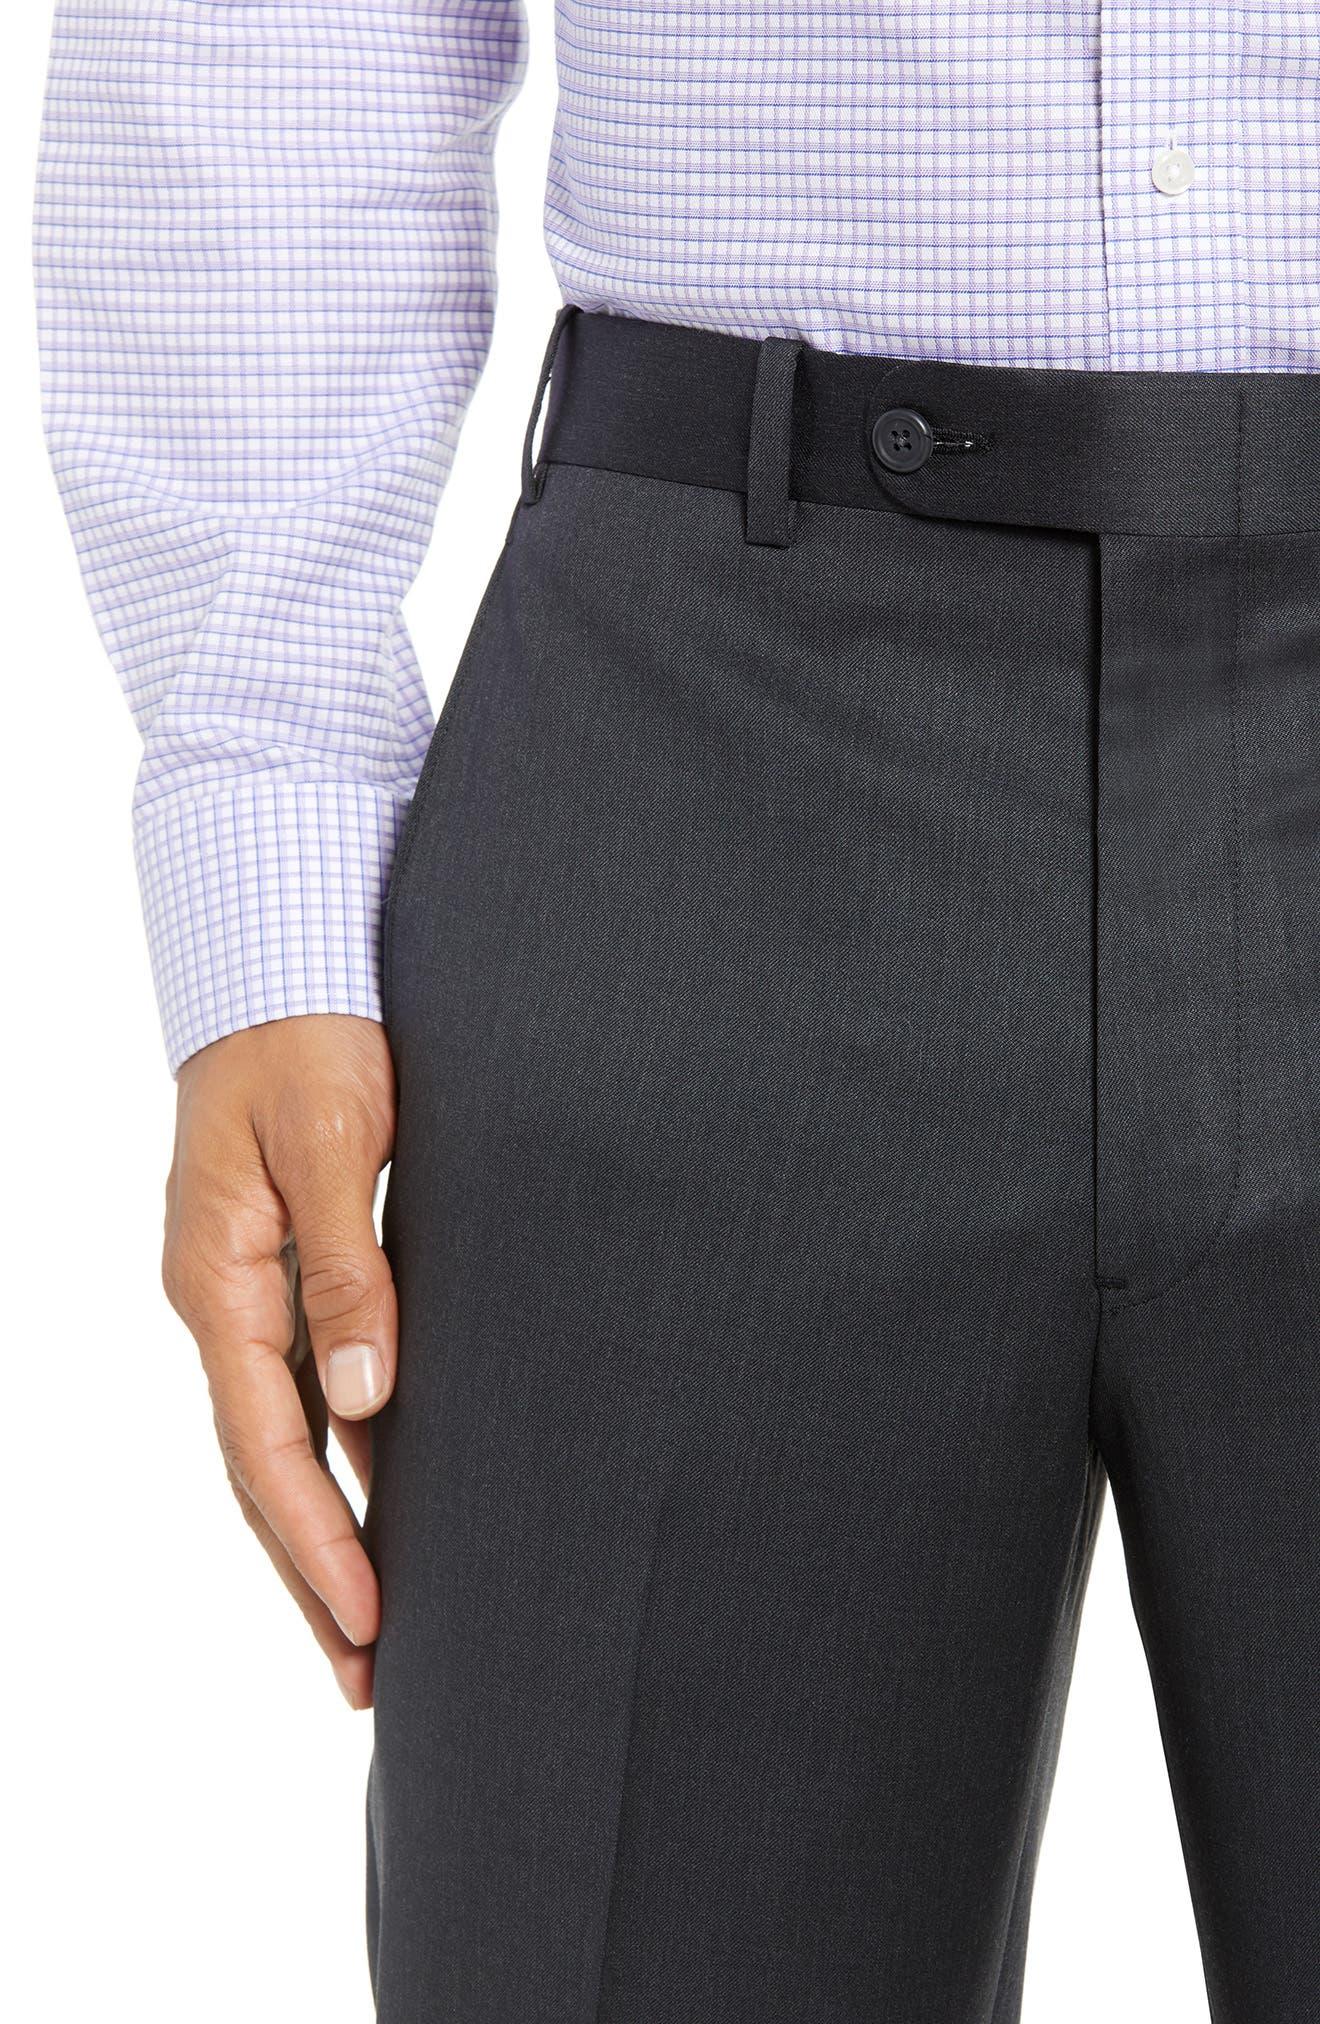 Torino Flat Front Wool Gabardine Trousers,                             Alternate thumbnail 20, color,